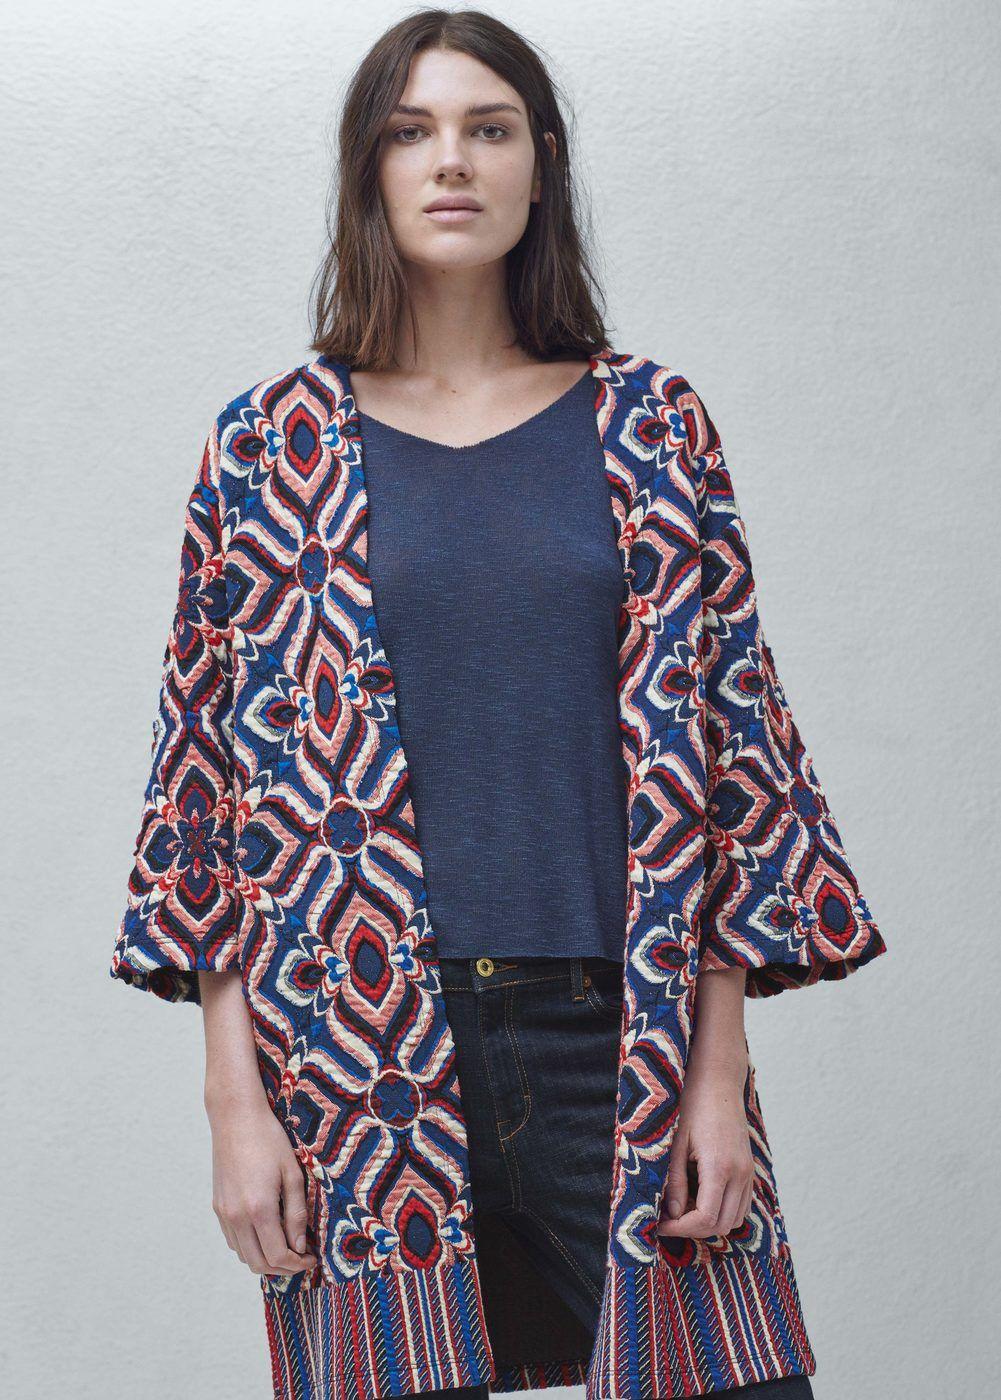 Printed caftan - Jackets for Woman | MANGO Lebanon